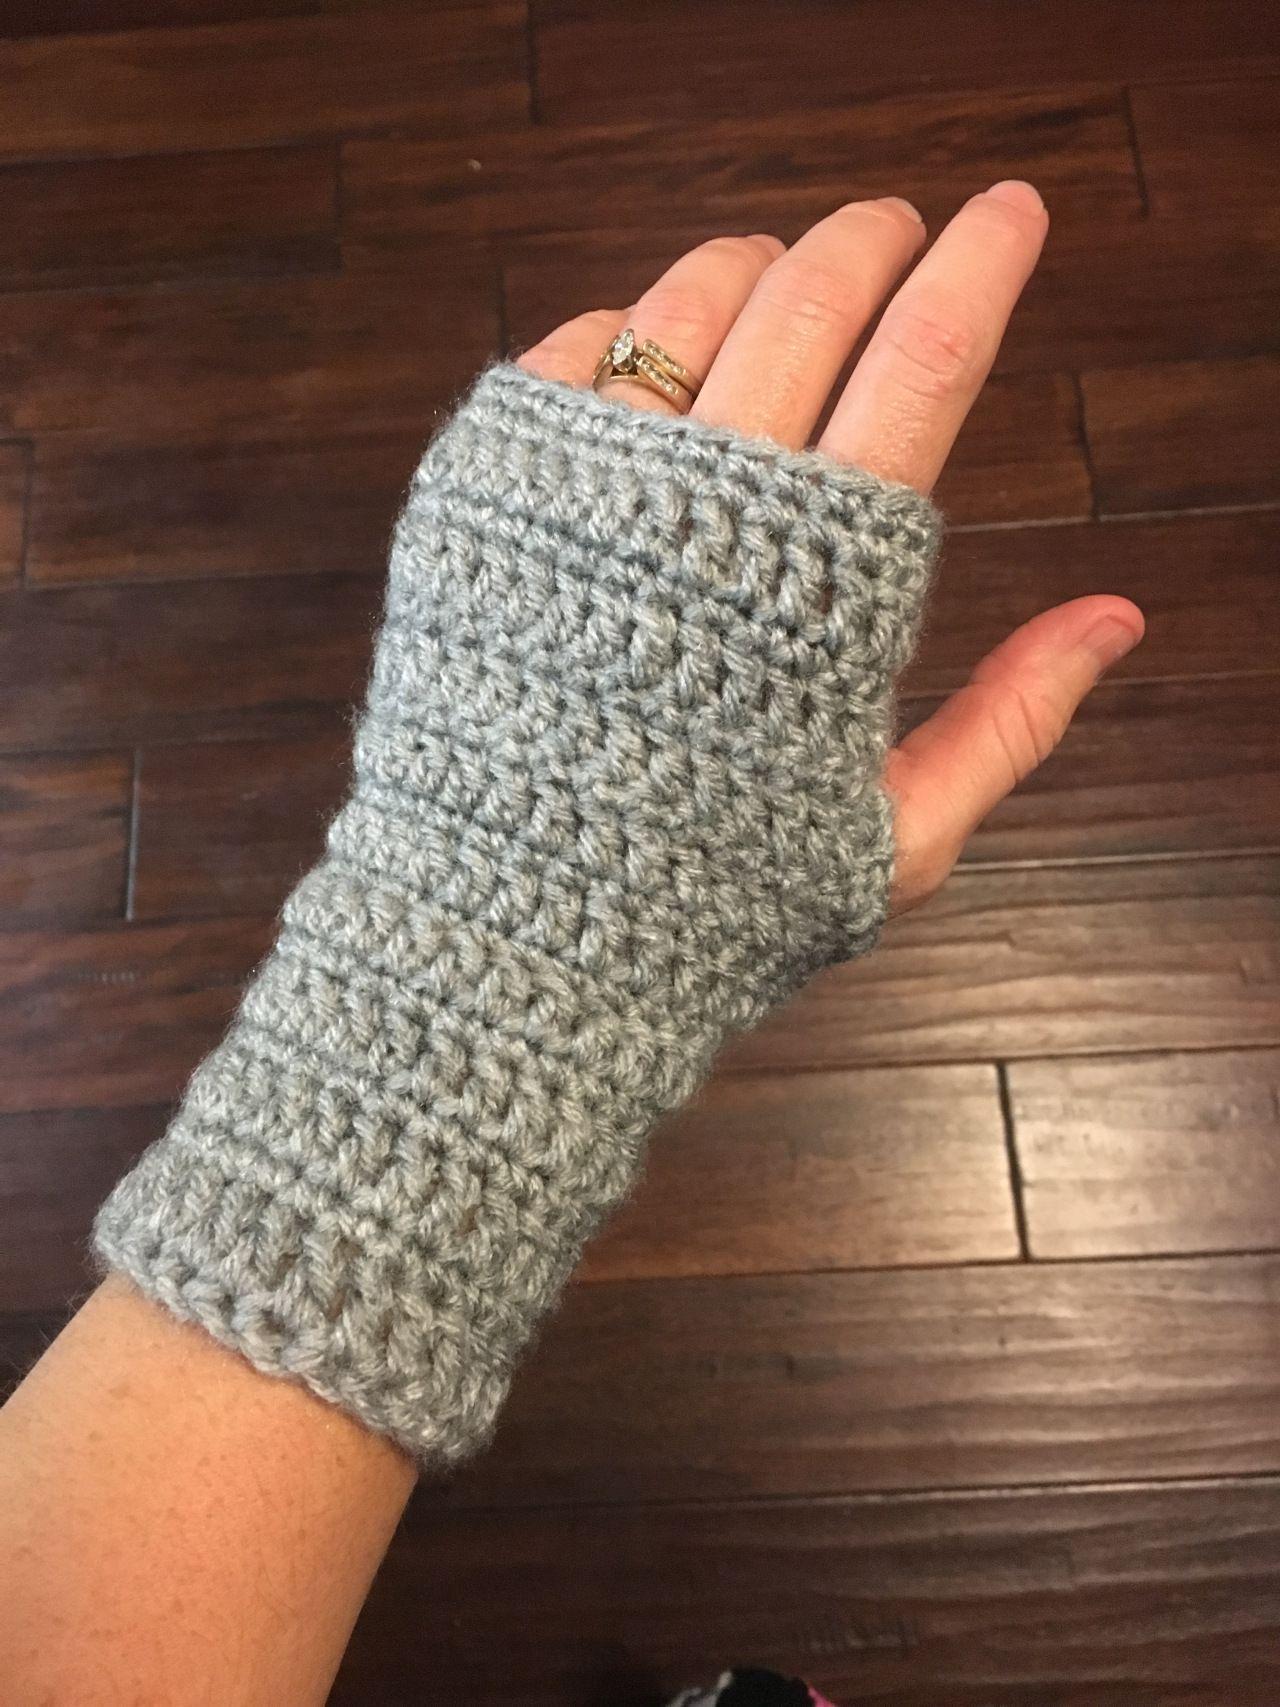 Simple Crochet Wrist Warmers | Wrist warmers, Fingerless gloves and ...